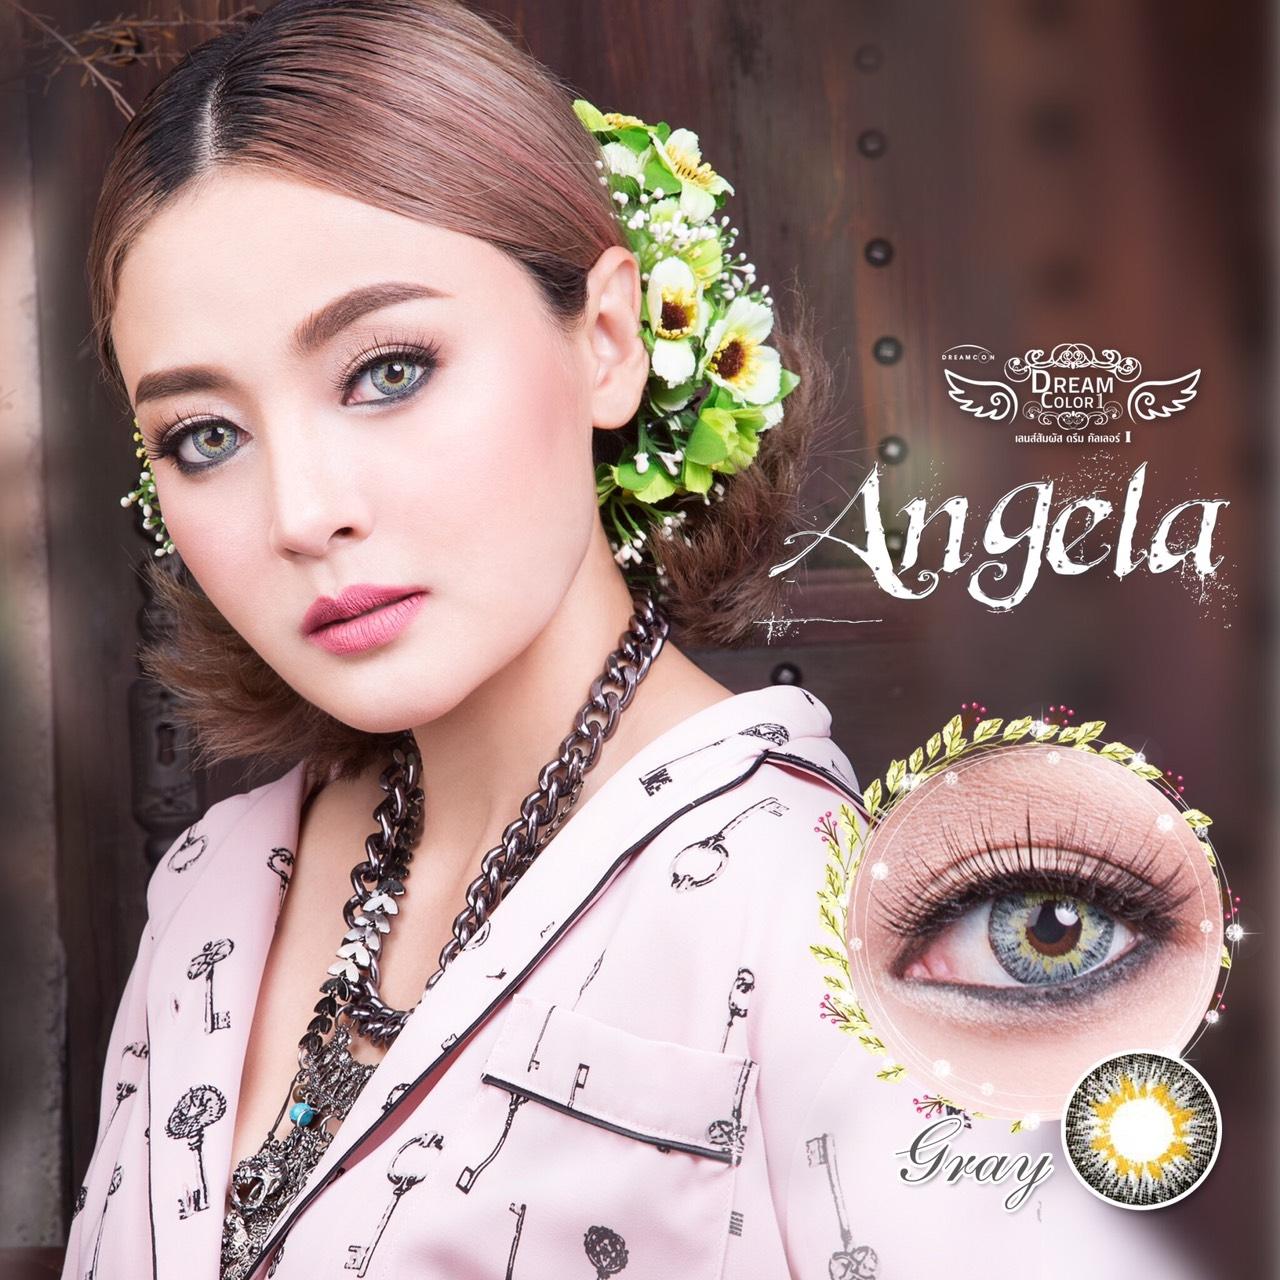 Angela Dreamcoloe1 แซ่บตาฝรั่ง